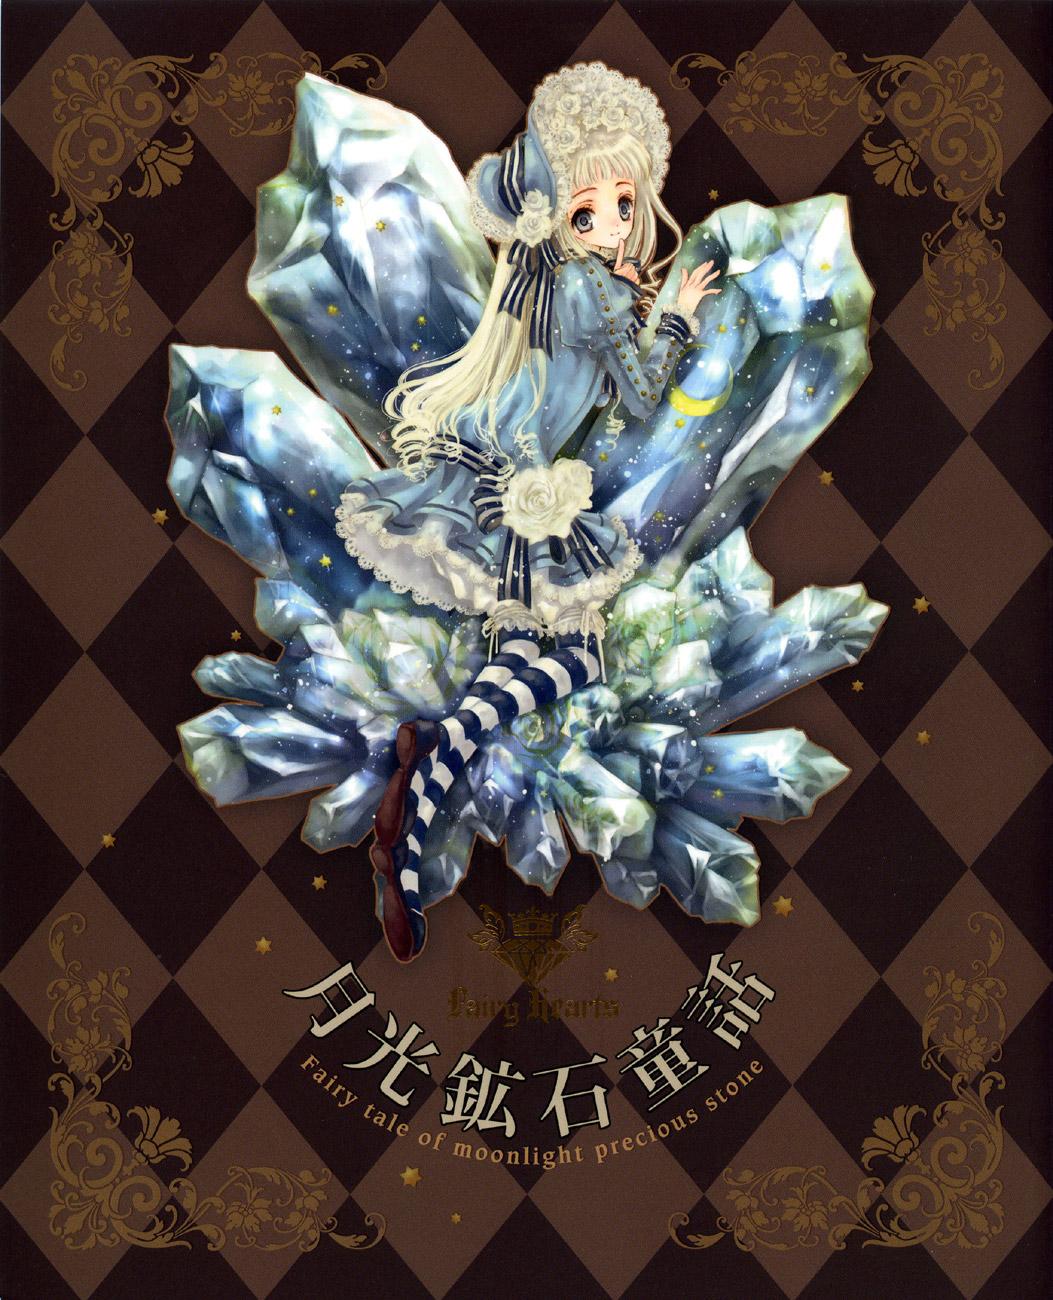 Fairy Hearts image by Tohru Adumi